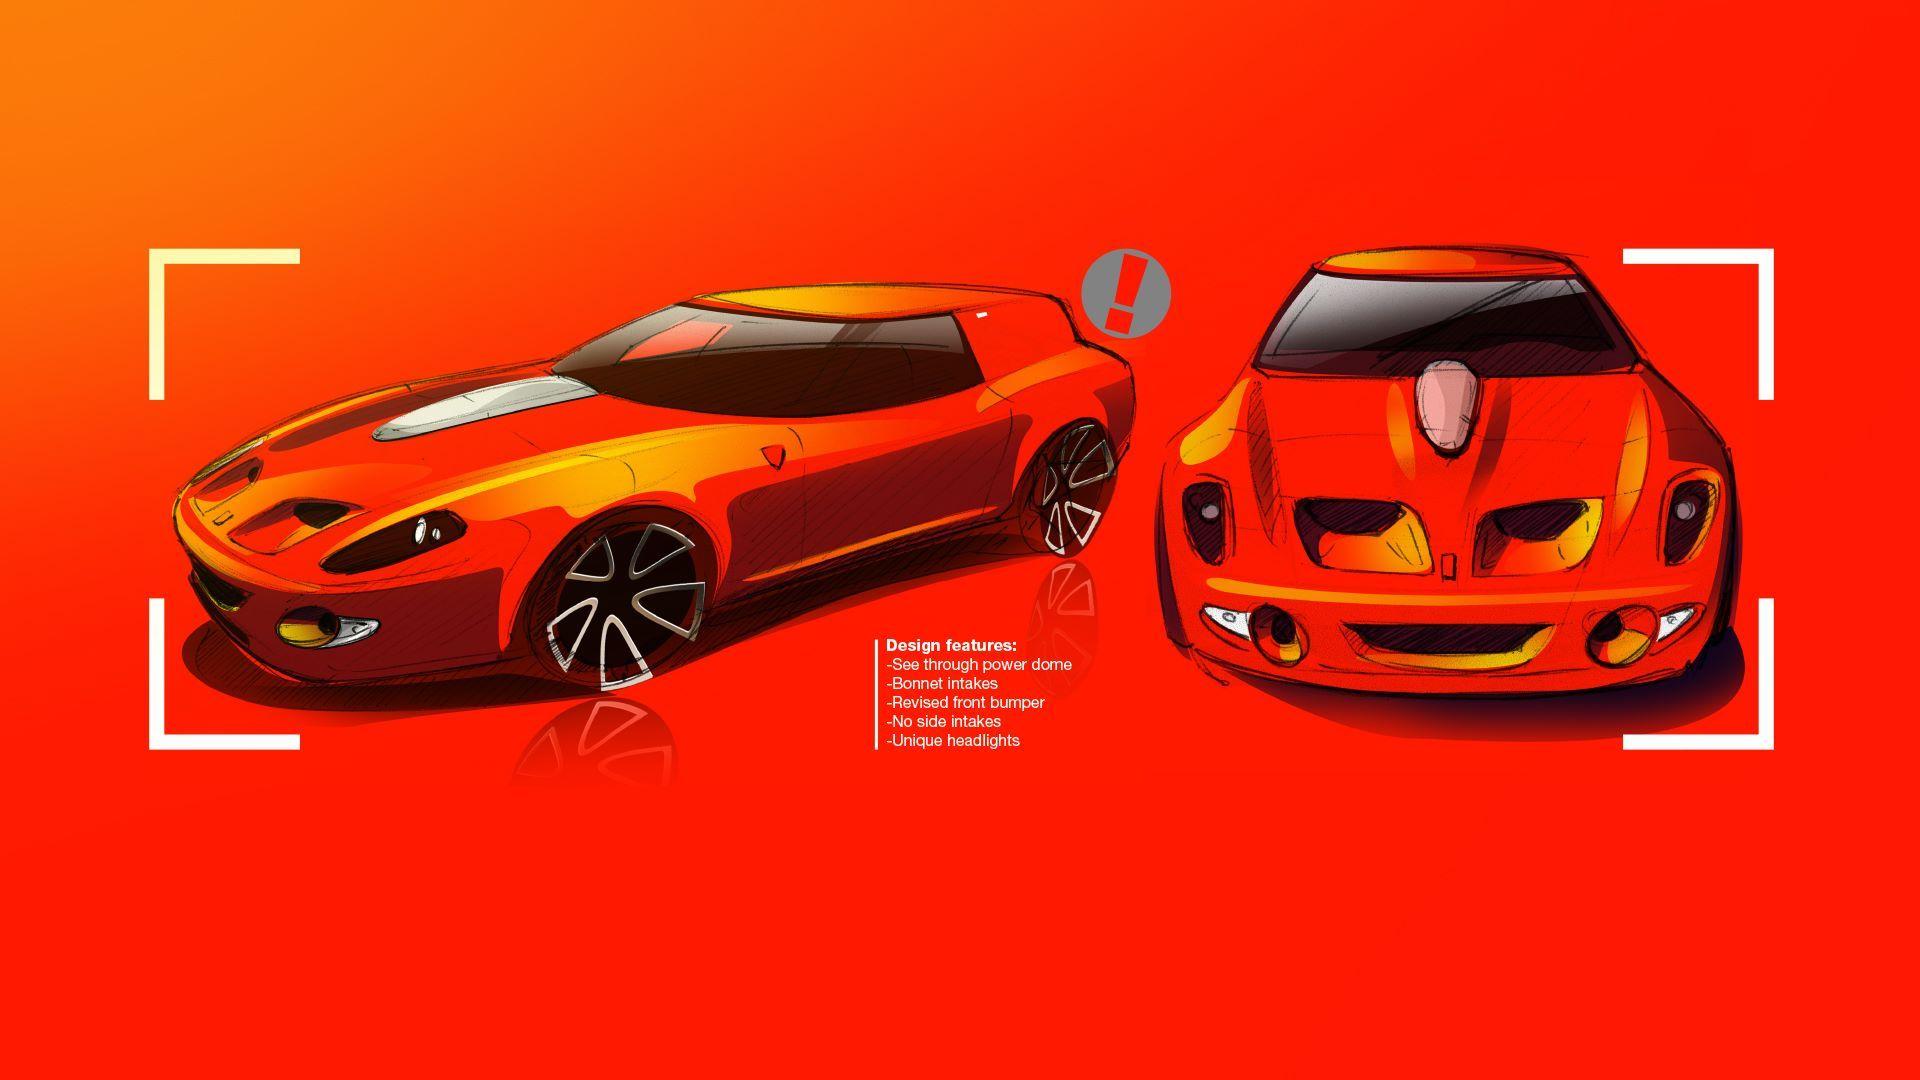 Ferrari-Breadvan-Hommage-66